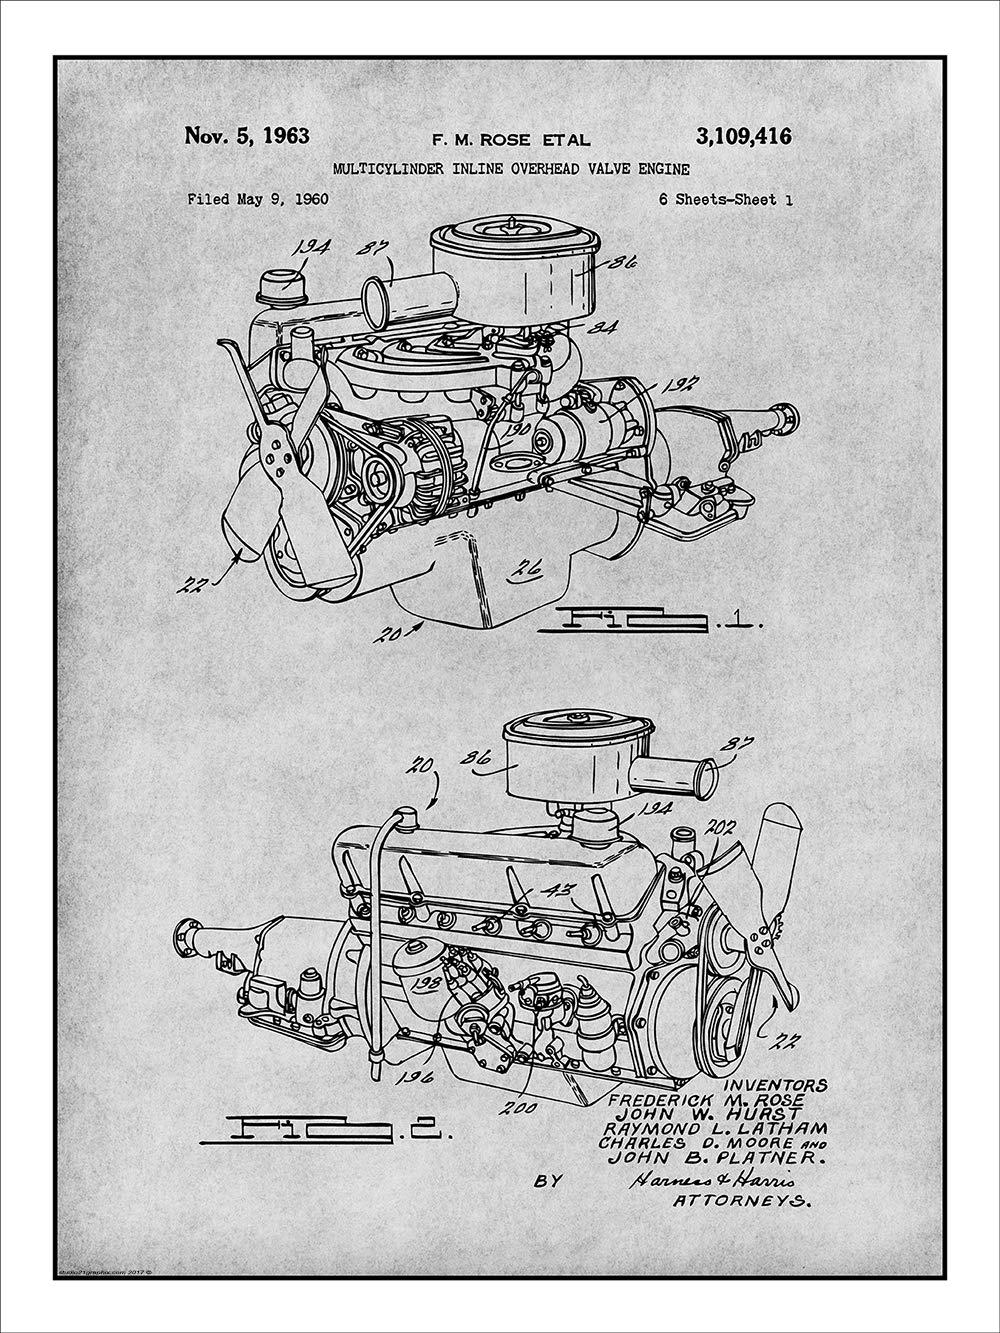 amazon com: studio 21 graphix 1960 chrysler 220 slant six engine patent  print art poster unframed gray 18